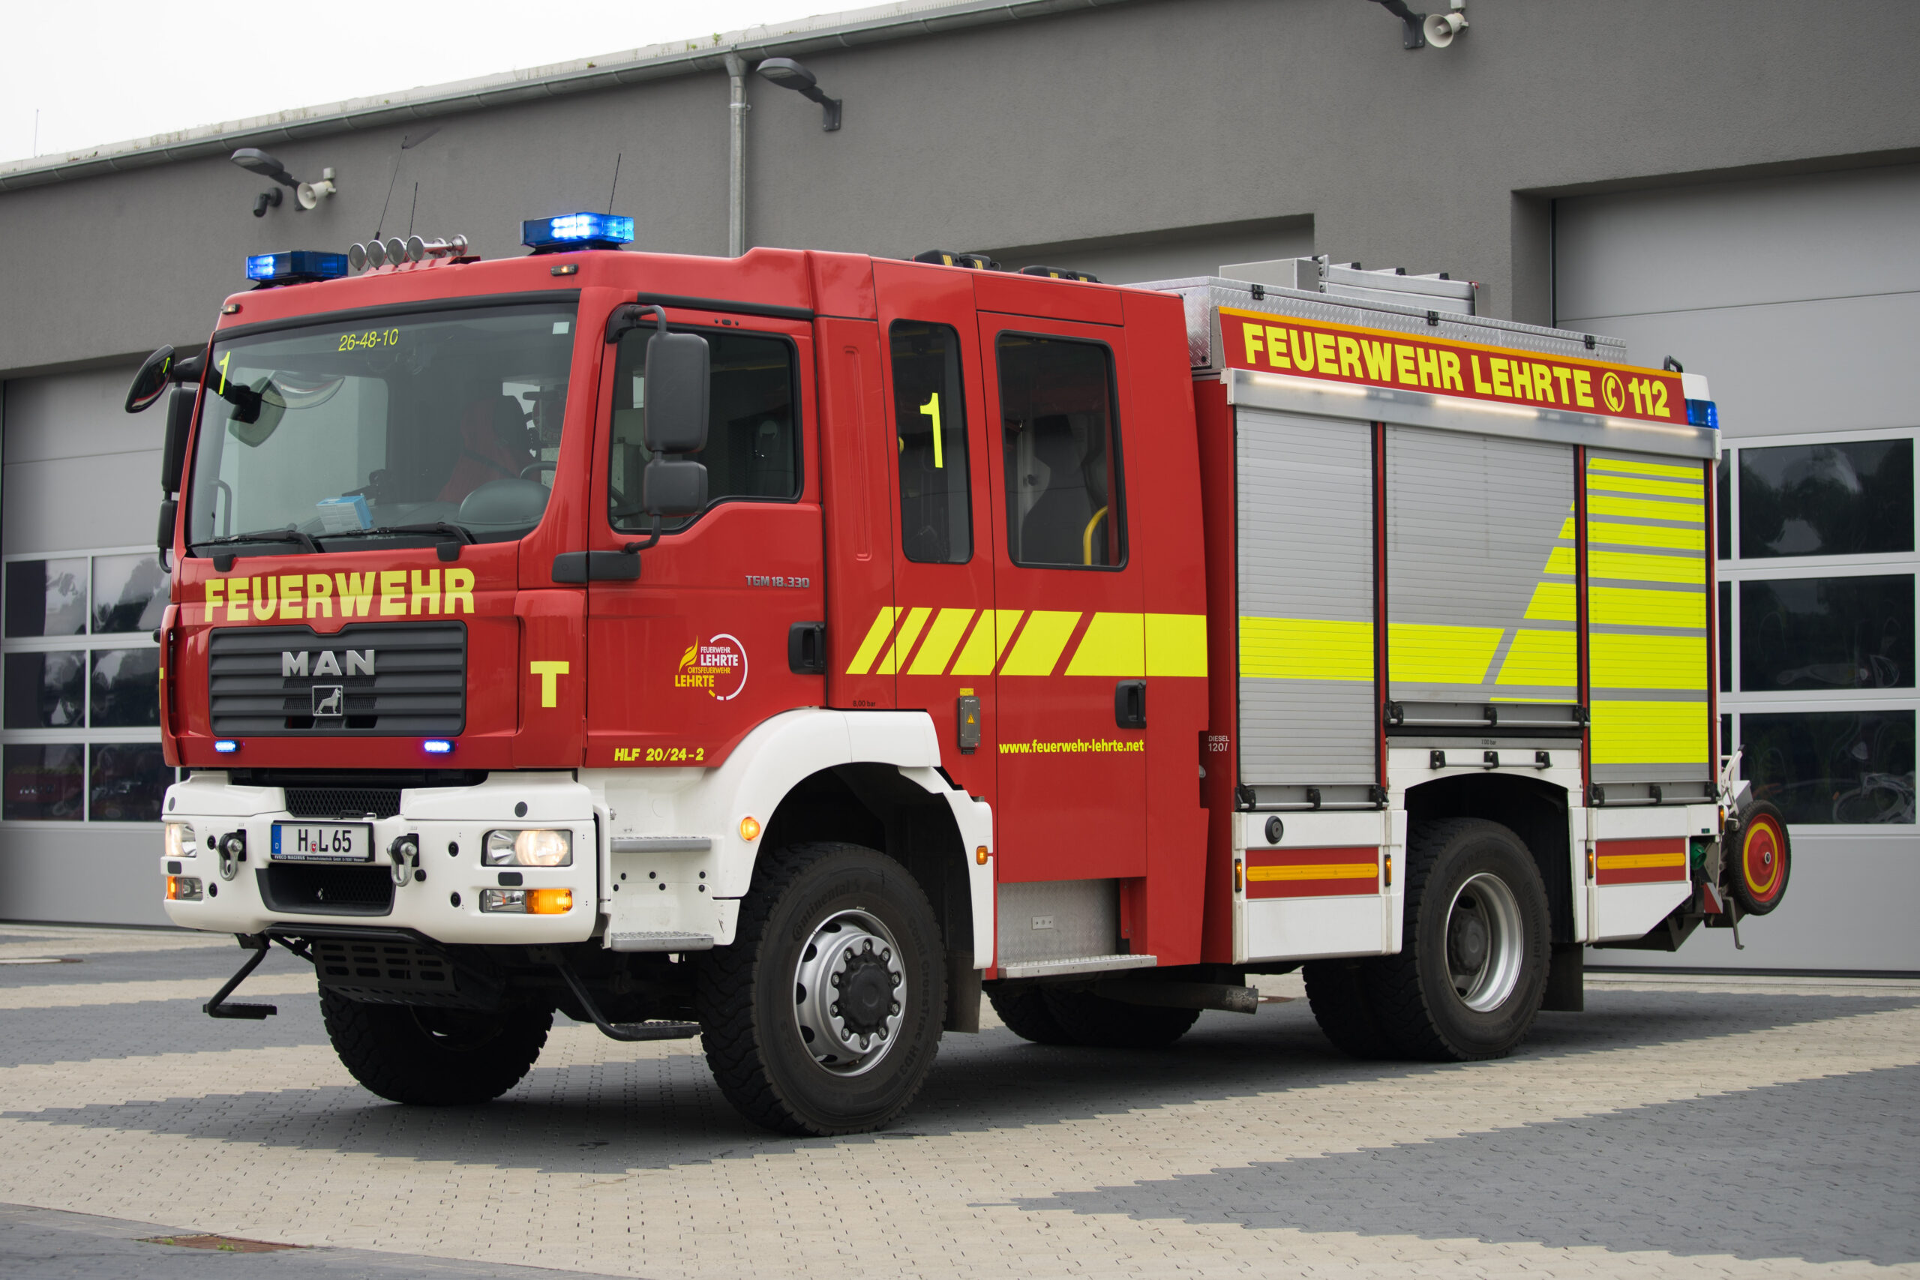 Florian Hannover-Land 26-48-10